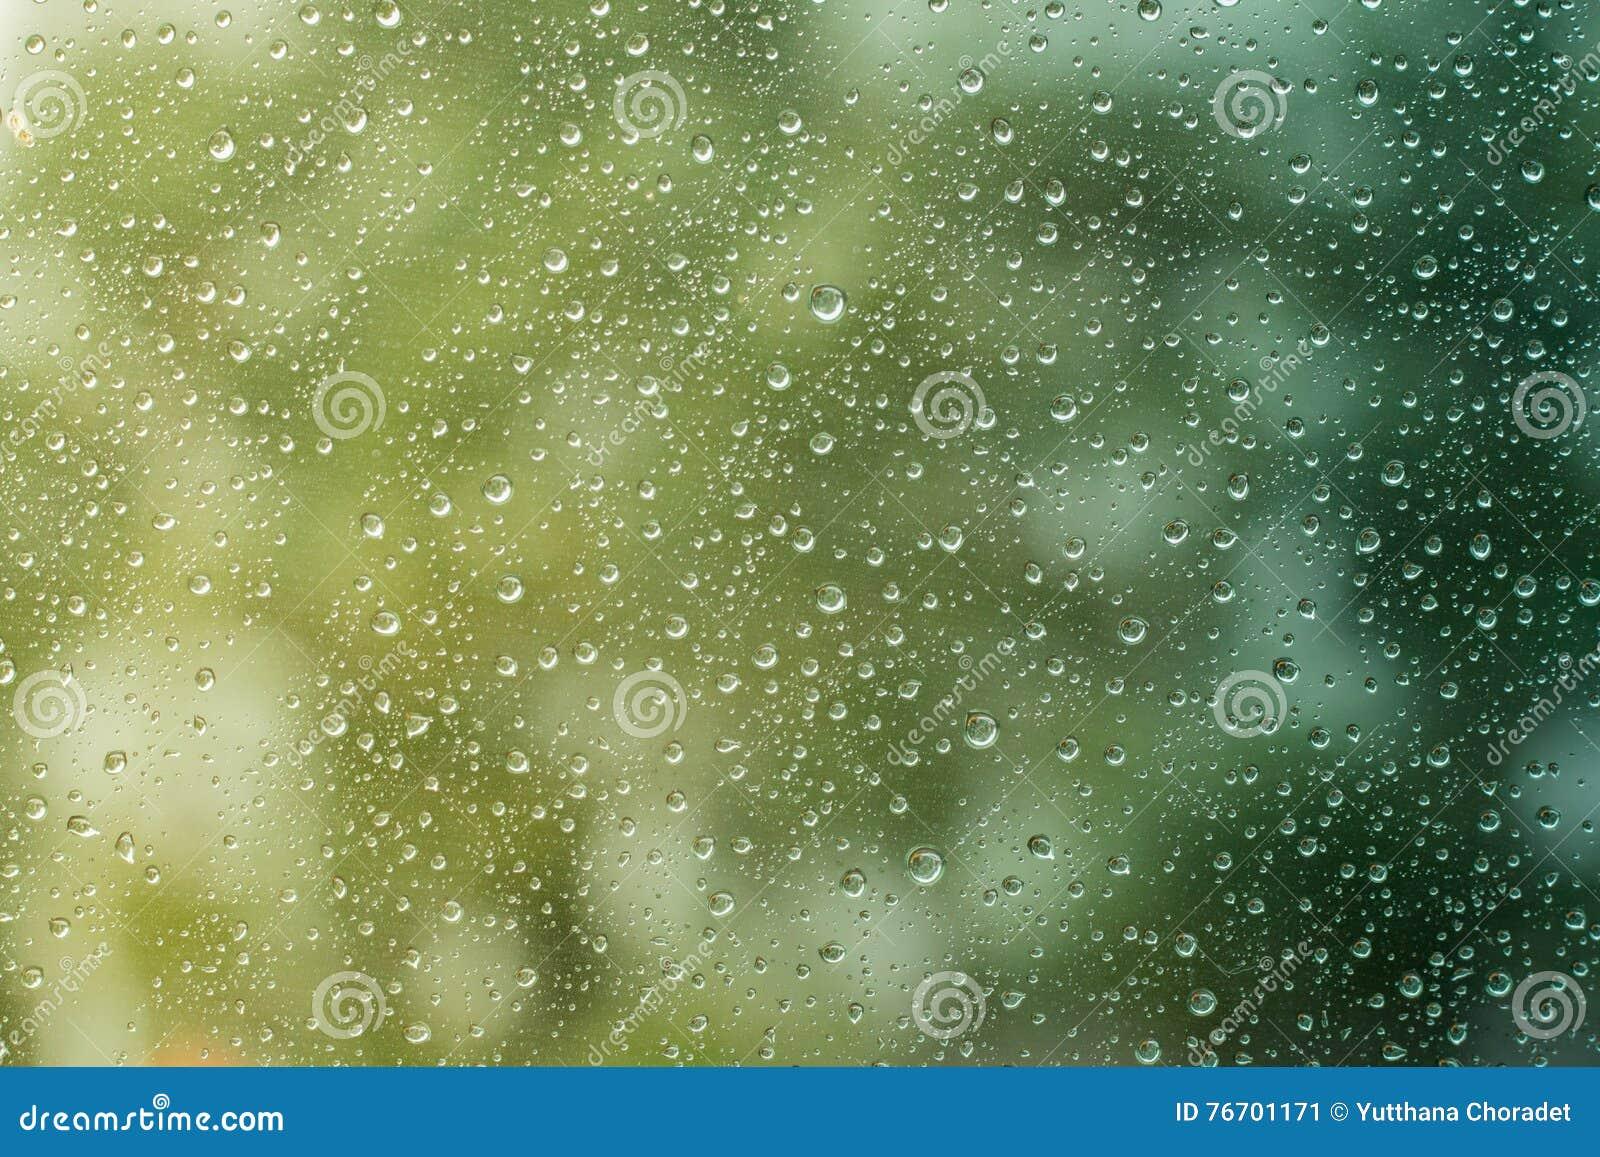 Rain drop at surface of a car. Water drop.